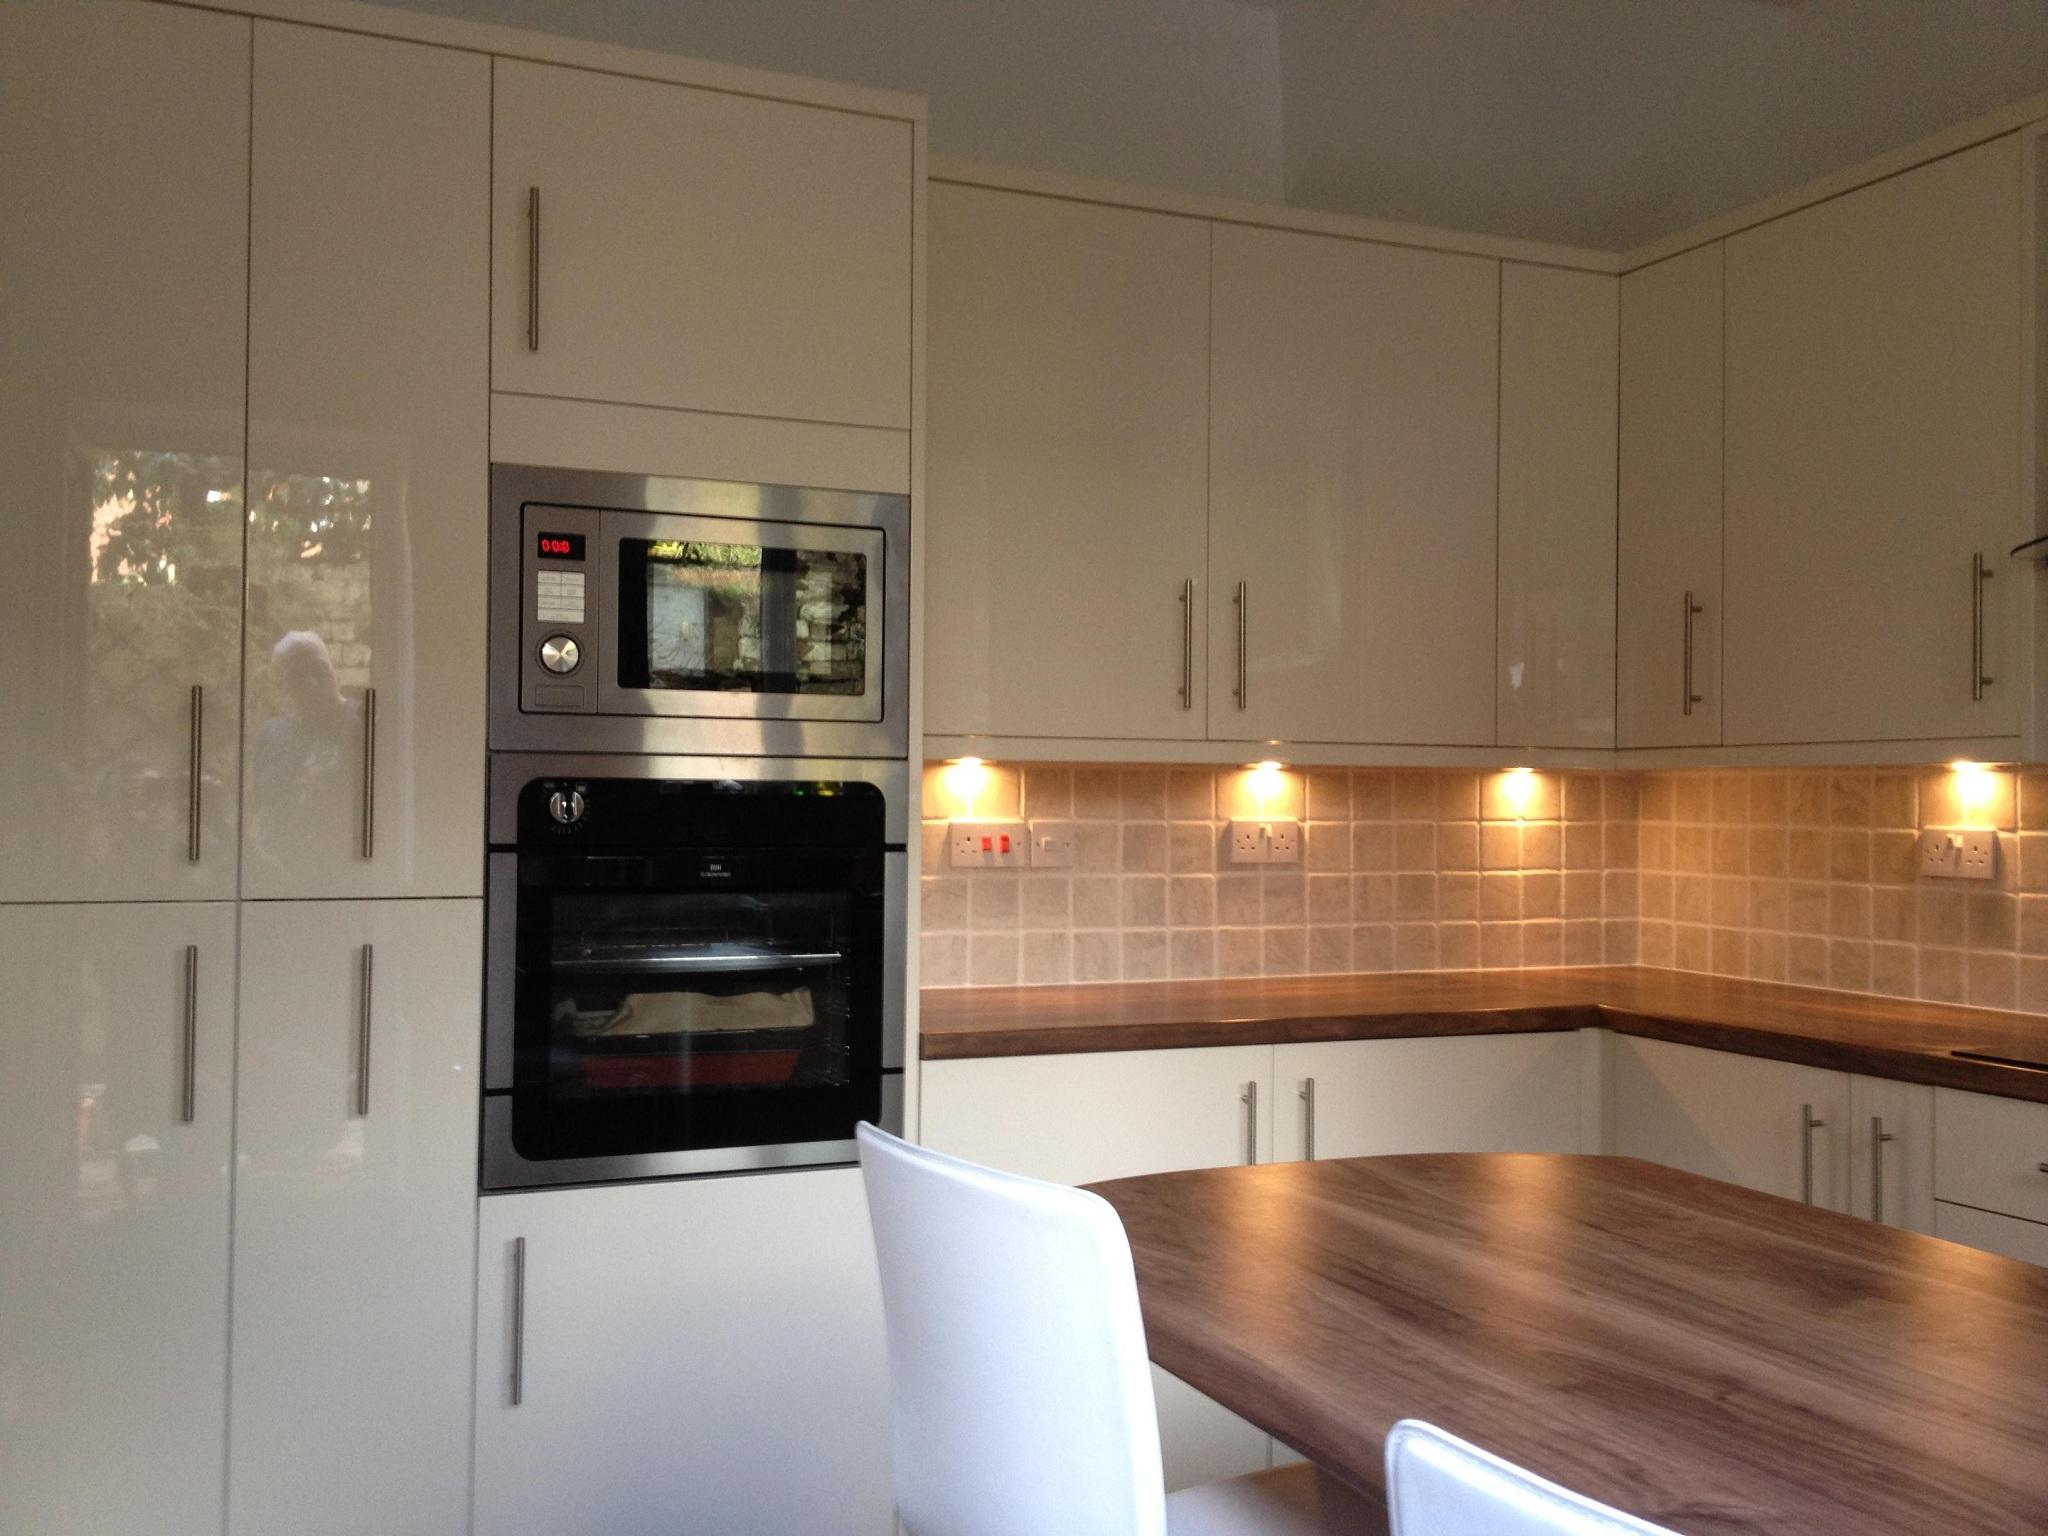 Modern Kitchen Cabinet Lighting  (View 7 of 10)